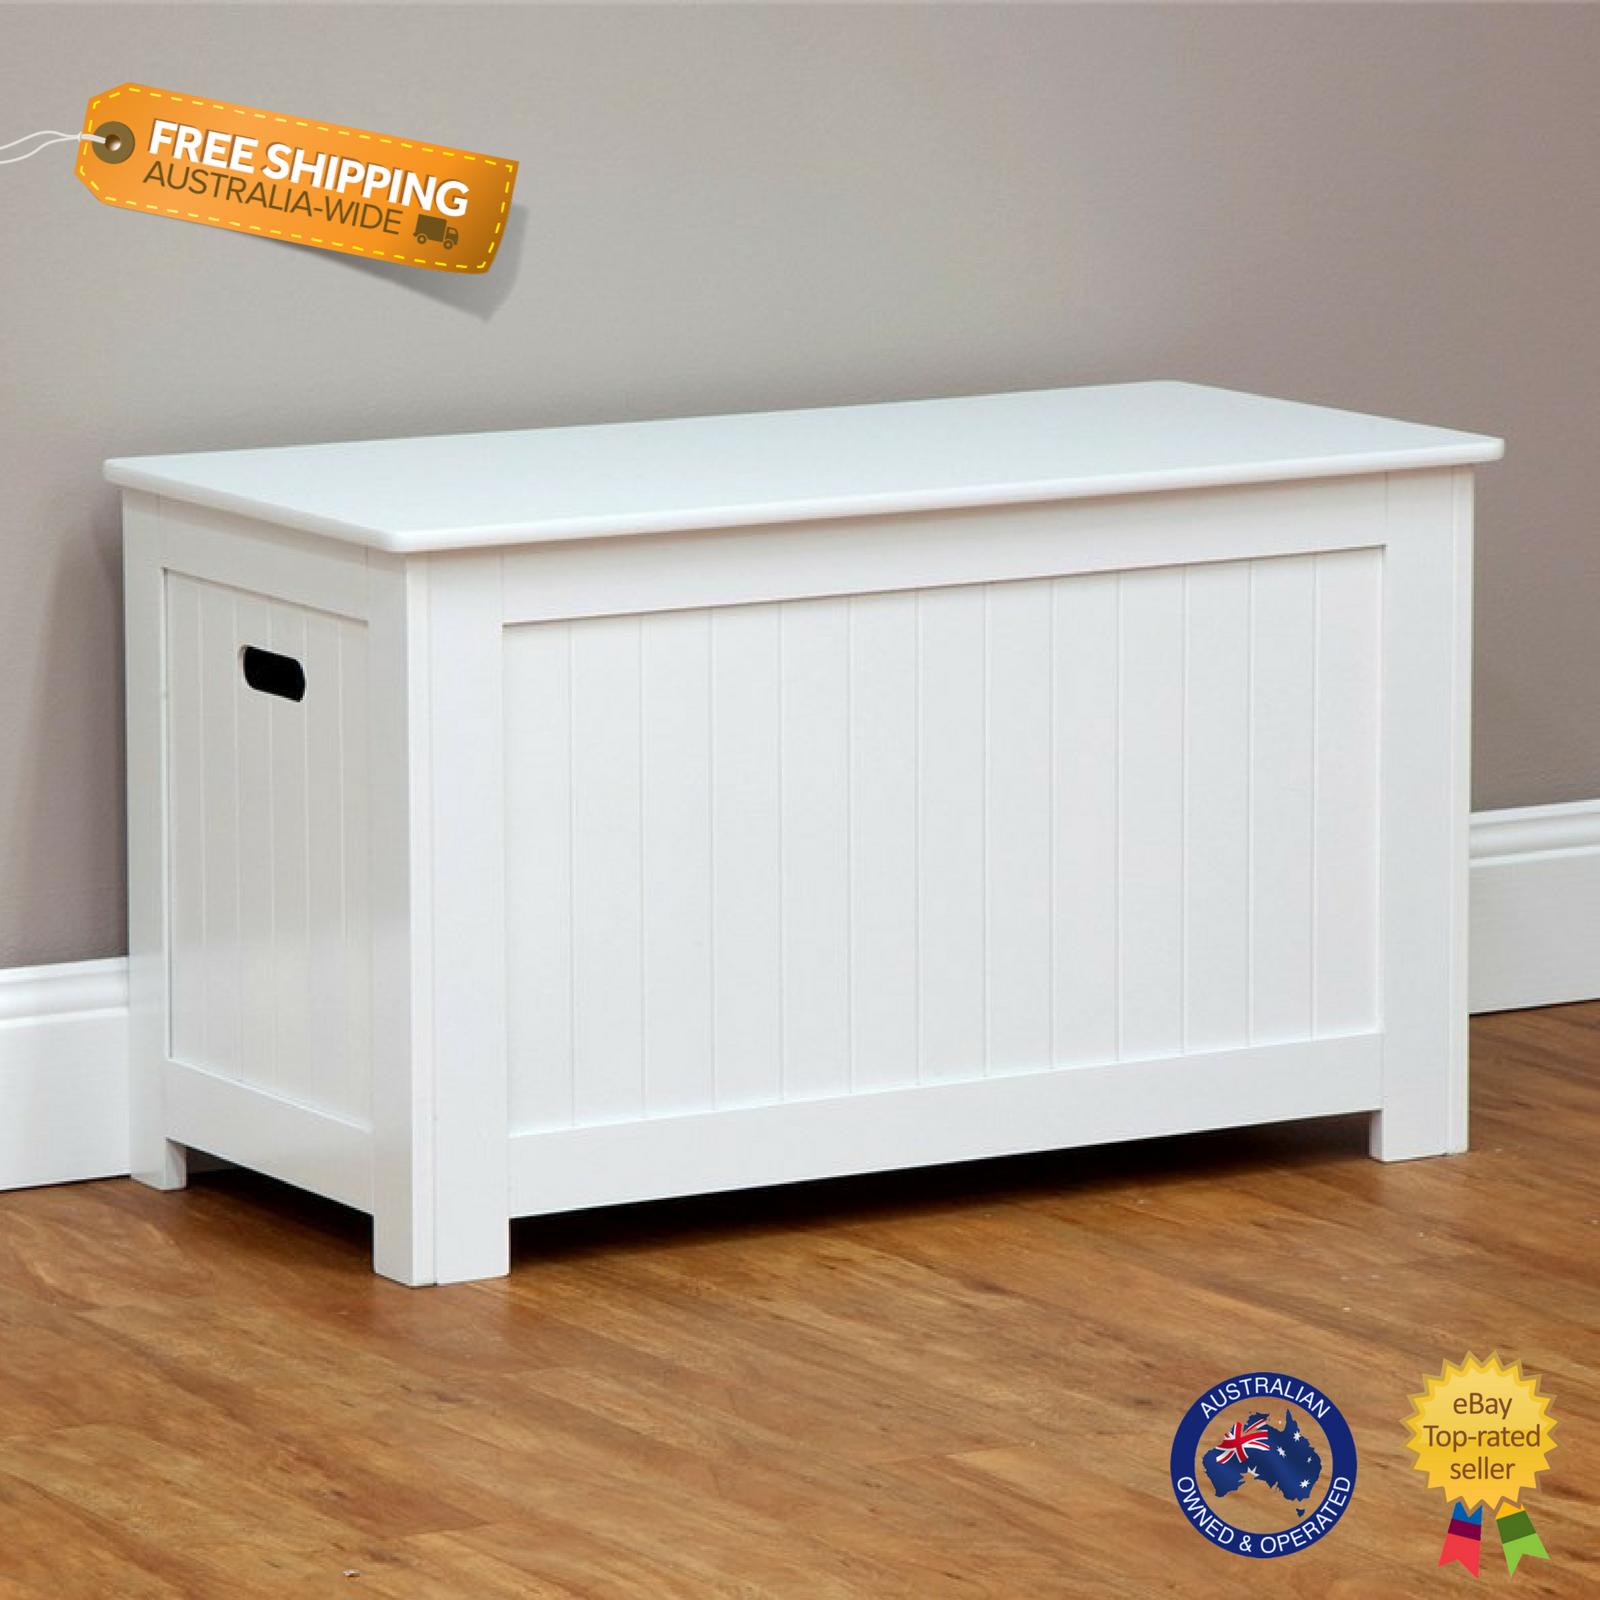 White Nursery Storage Bench Kid Toy Box Linen Chest Lift Up Lid